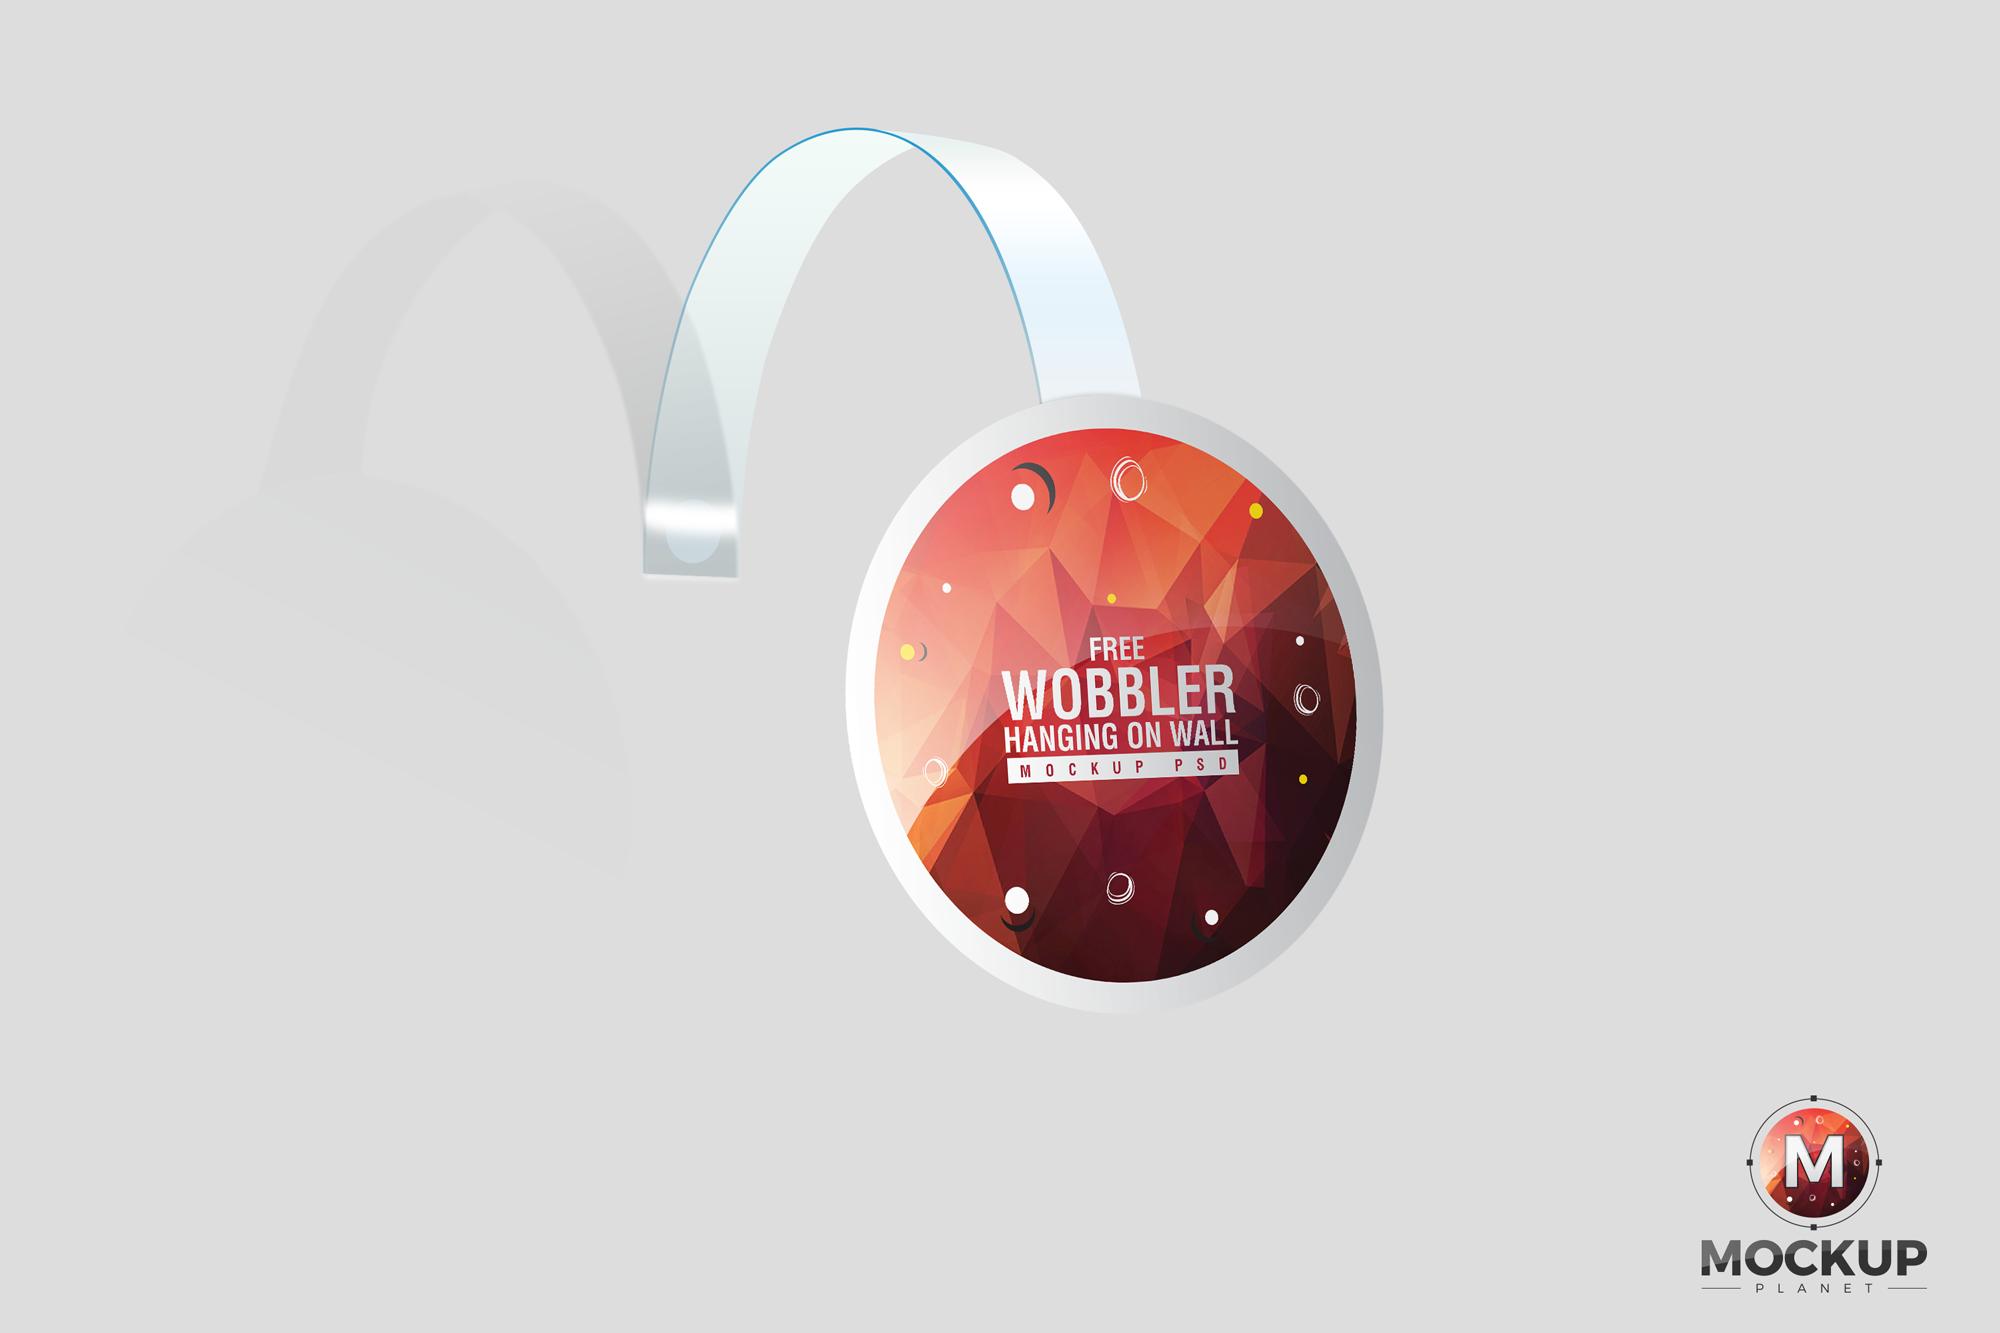 Free Wobbler Hanging on Wall Mockup (PSD)